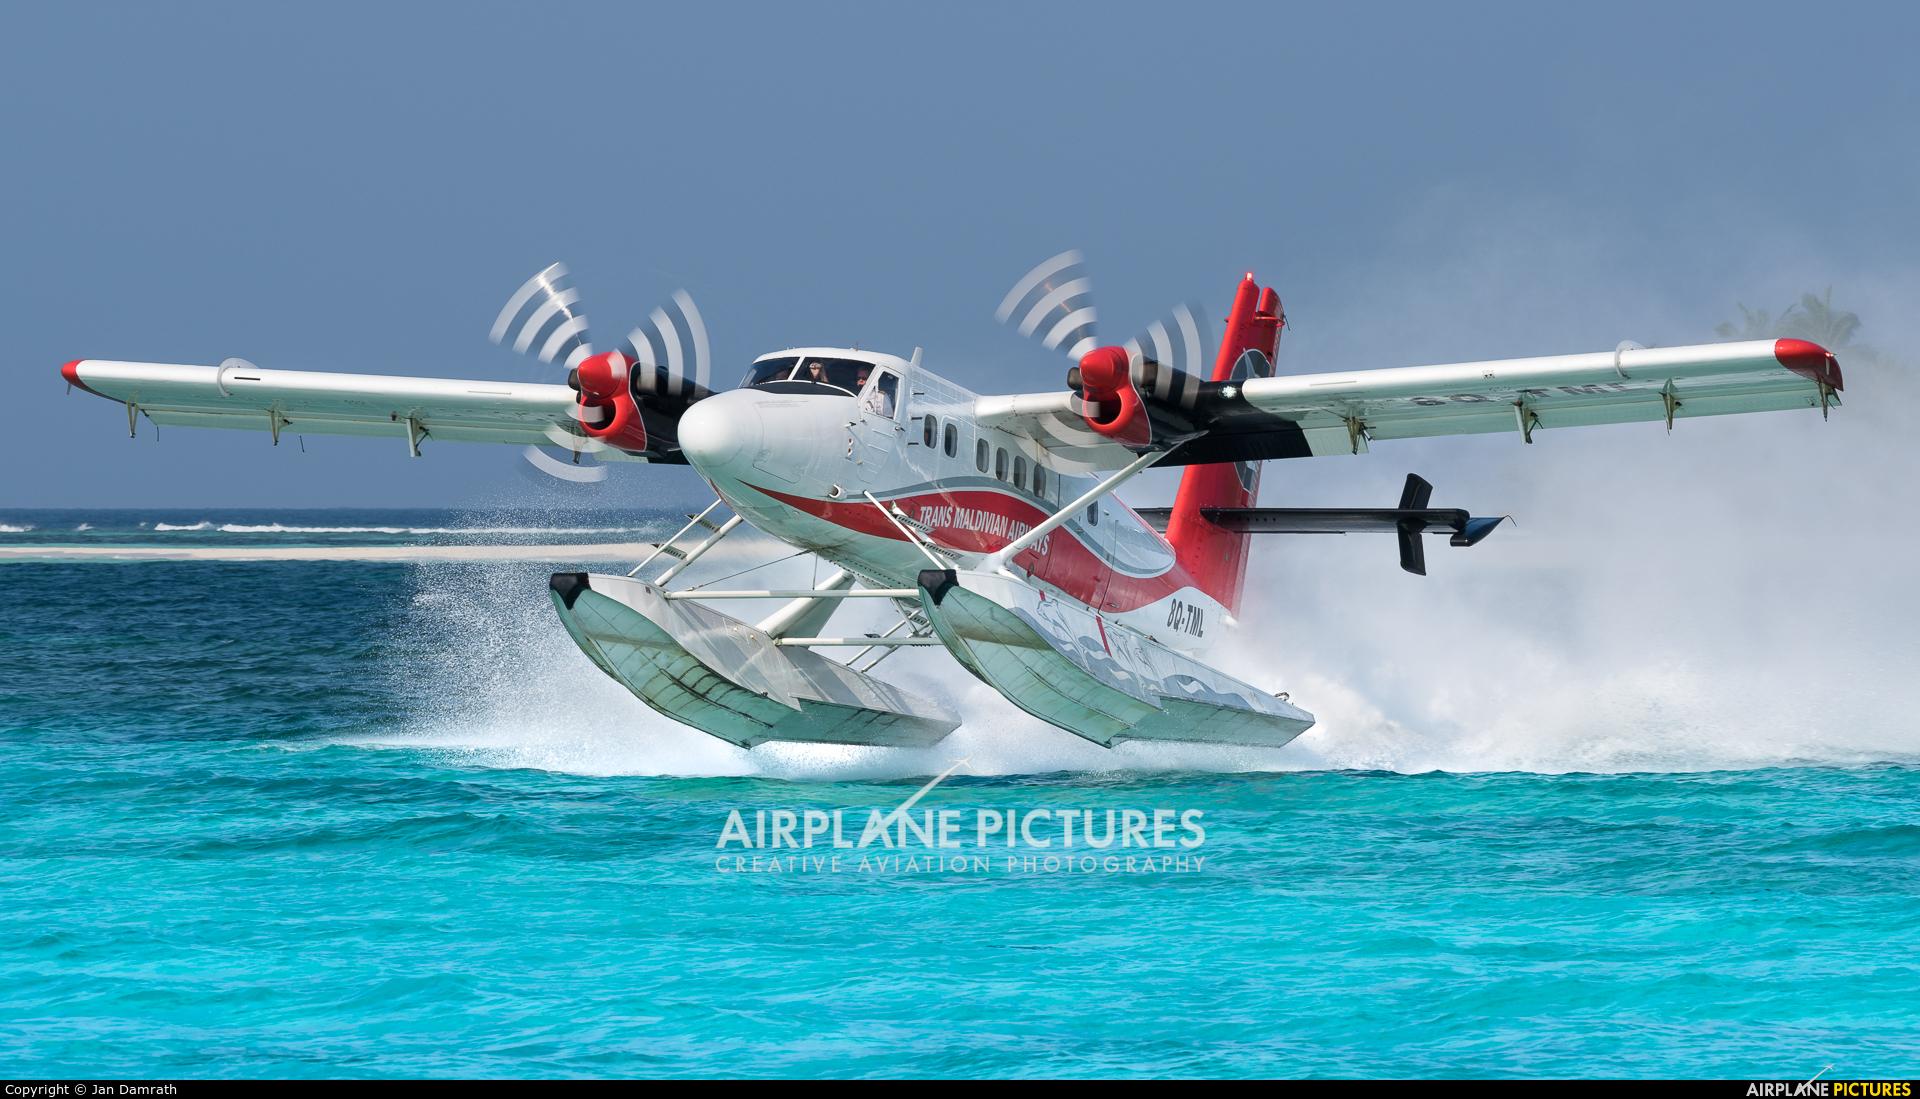 Trans Maldivian Airways - TMA 8Q-TML aircraft at Off Airport - Maldives